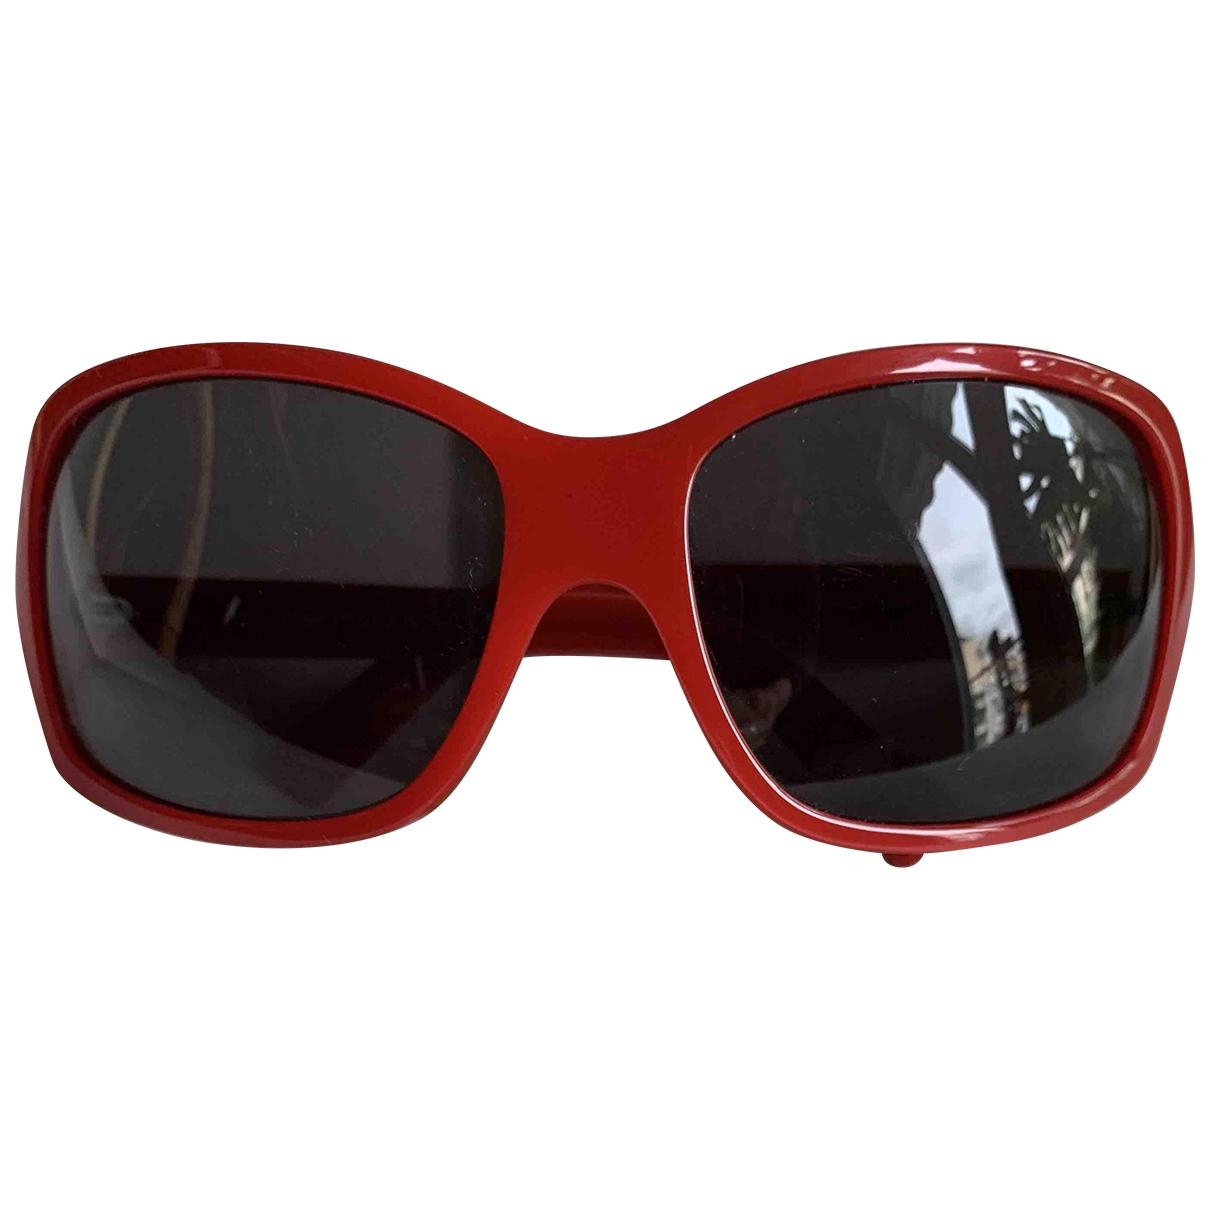 Dolce & Gabbana \N Red Sunglasses for Women \N